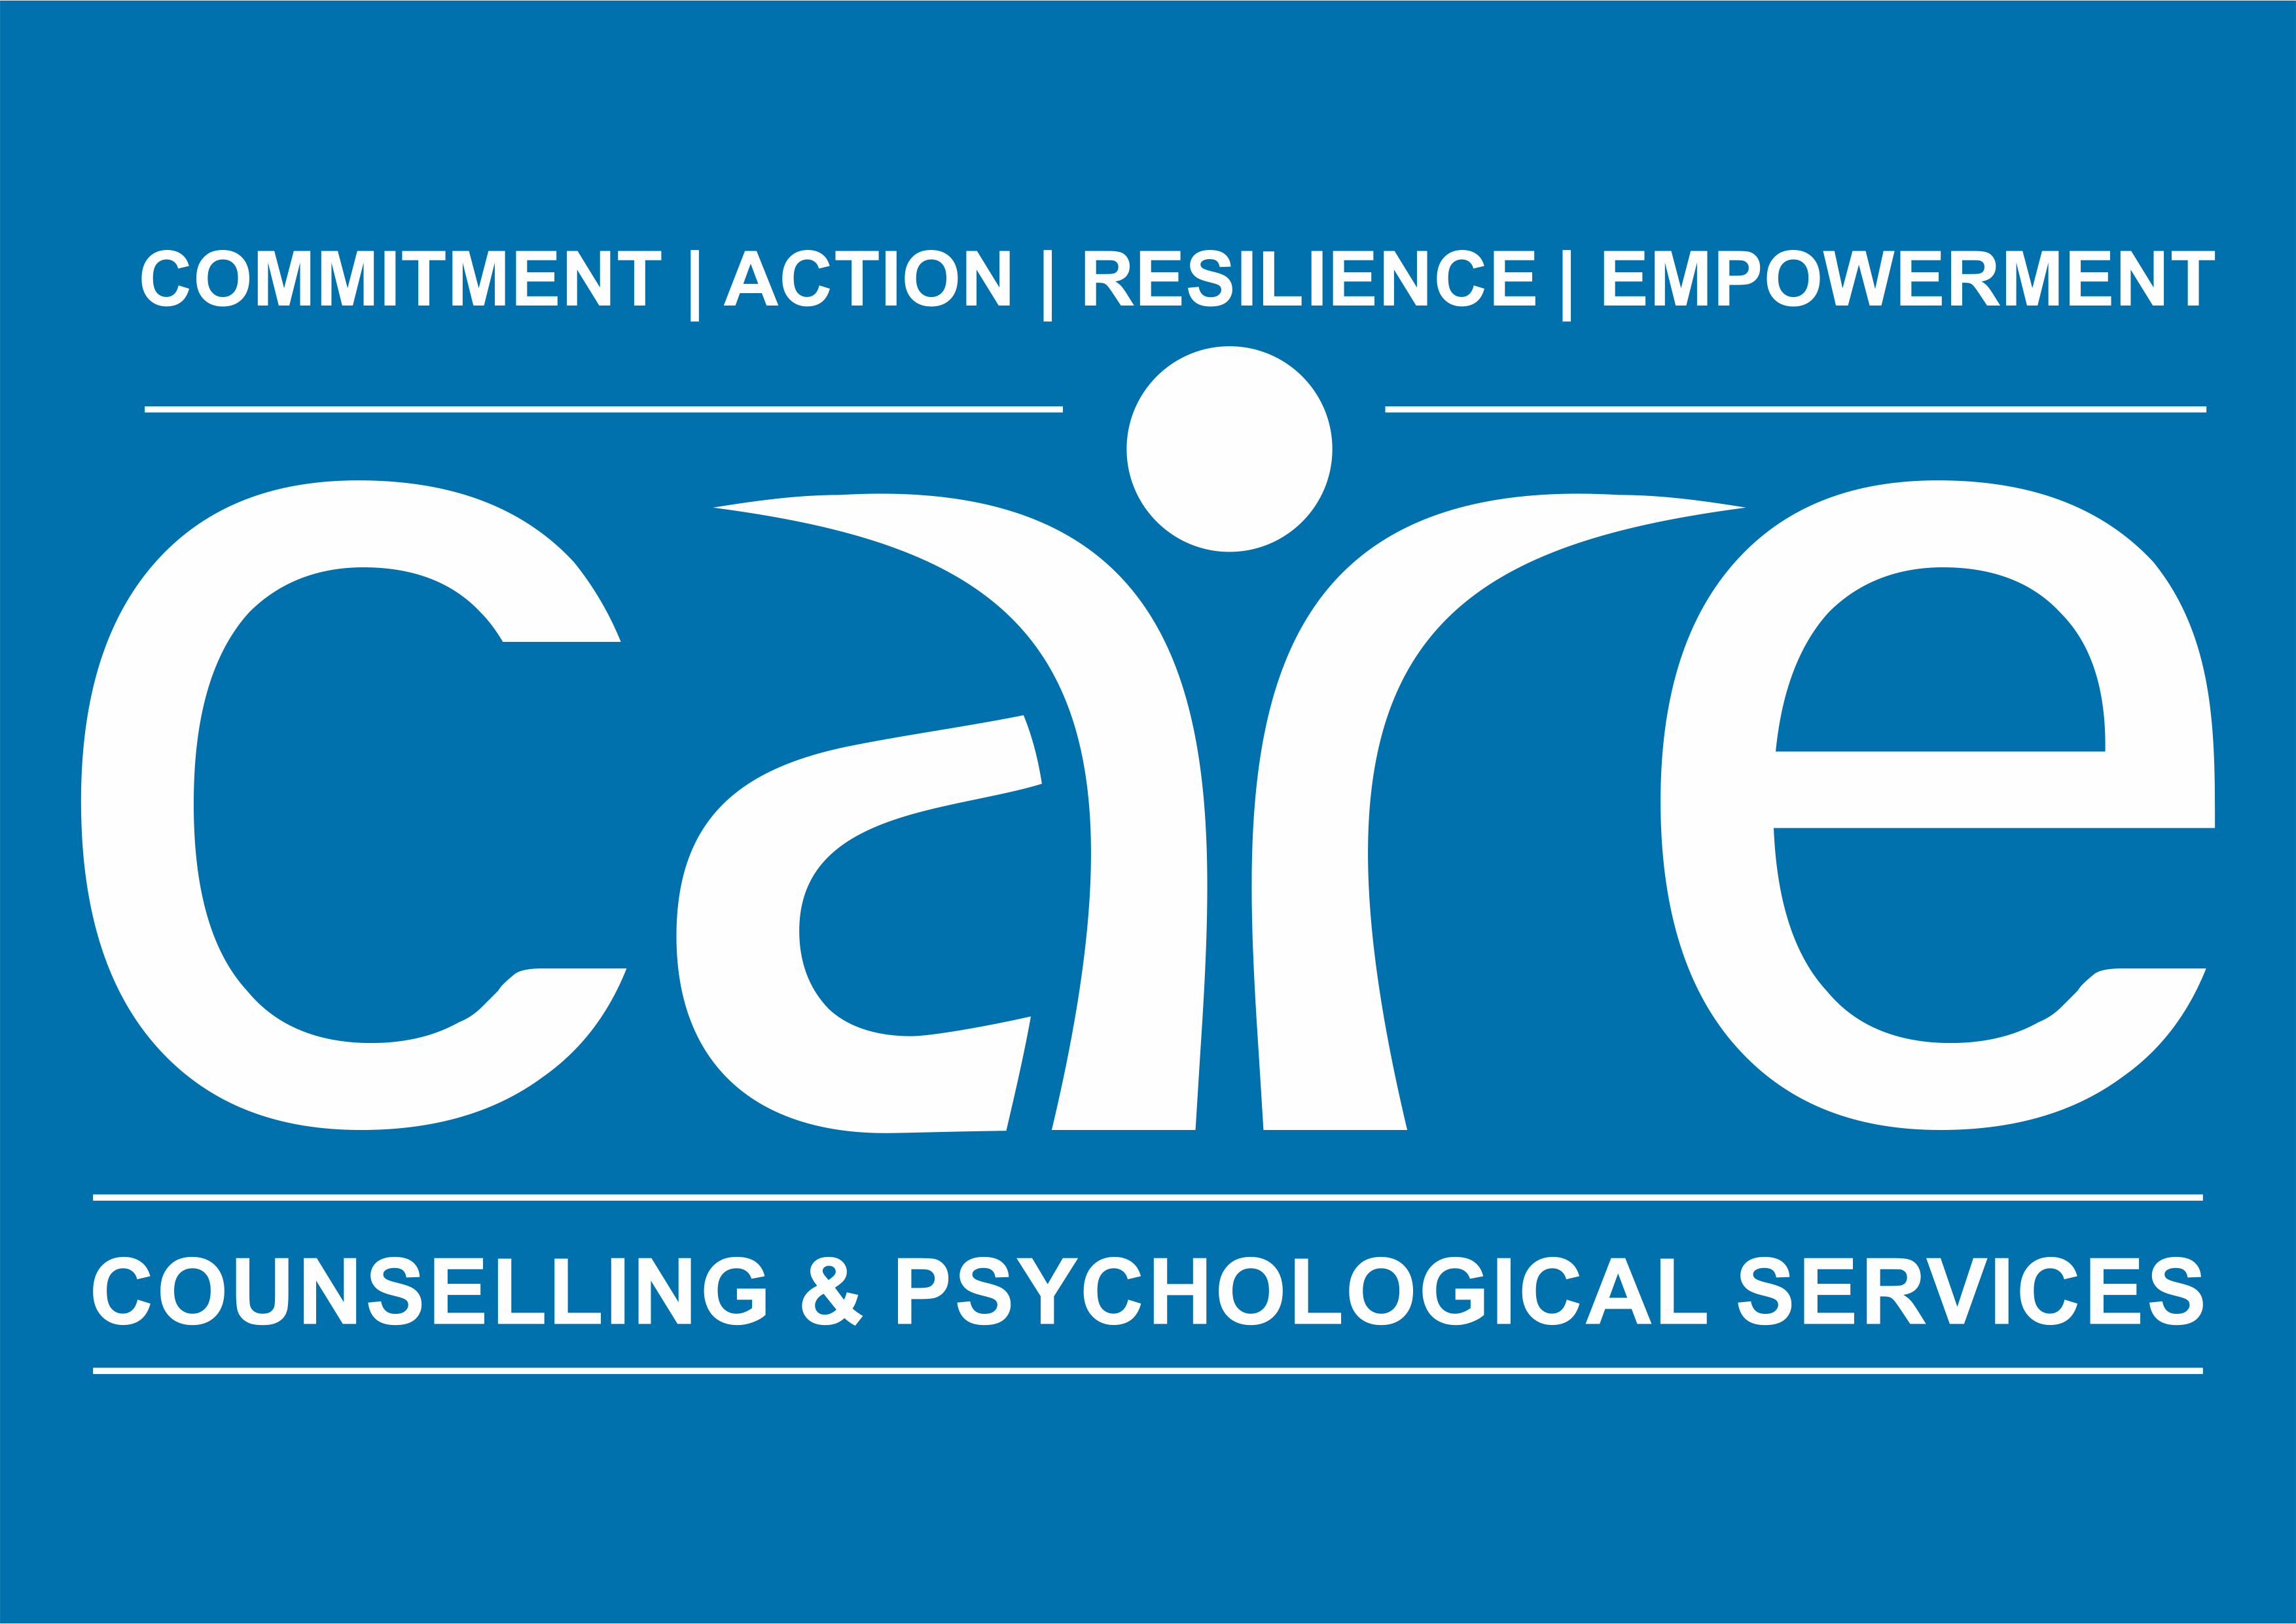 Care-Handover-blue-and-white